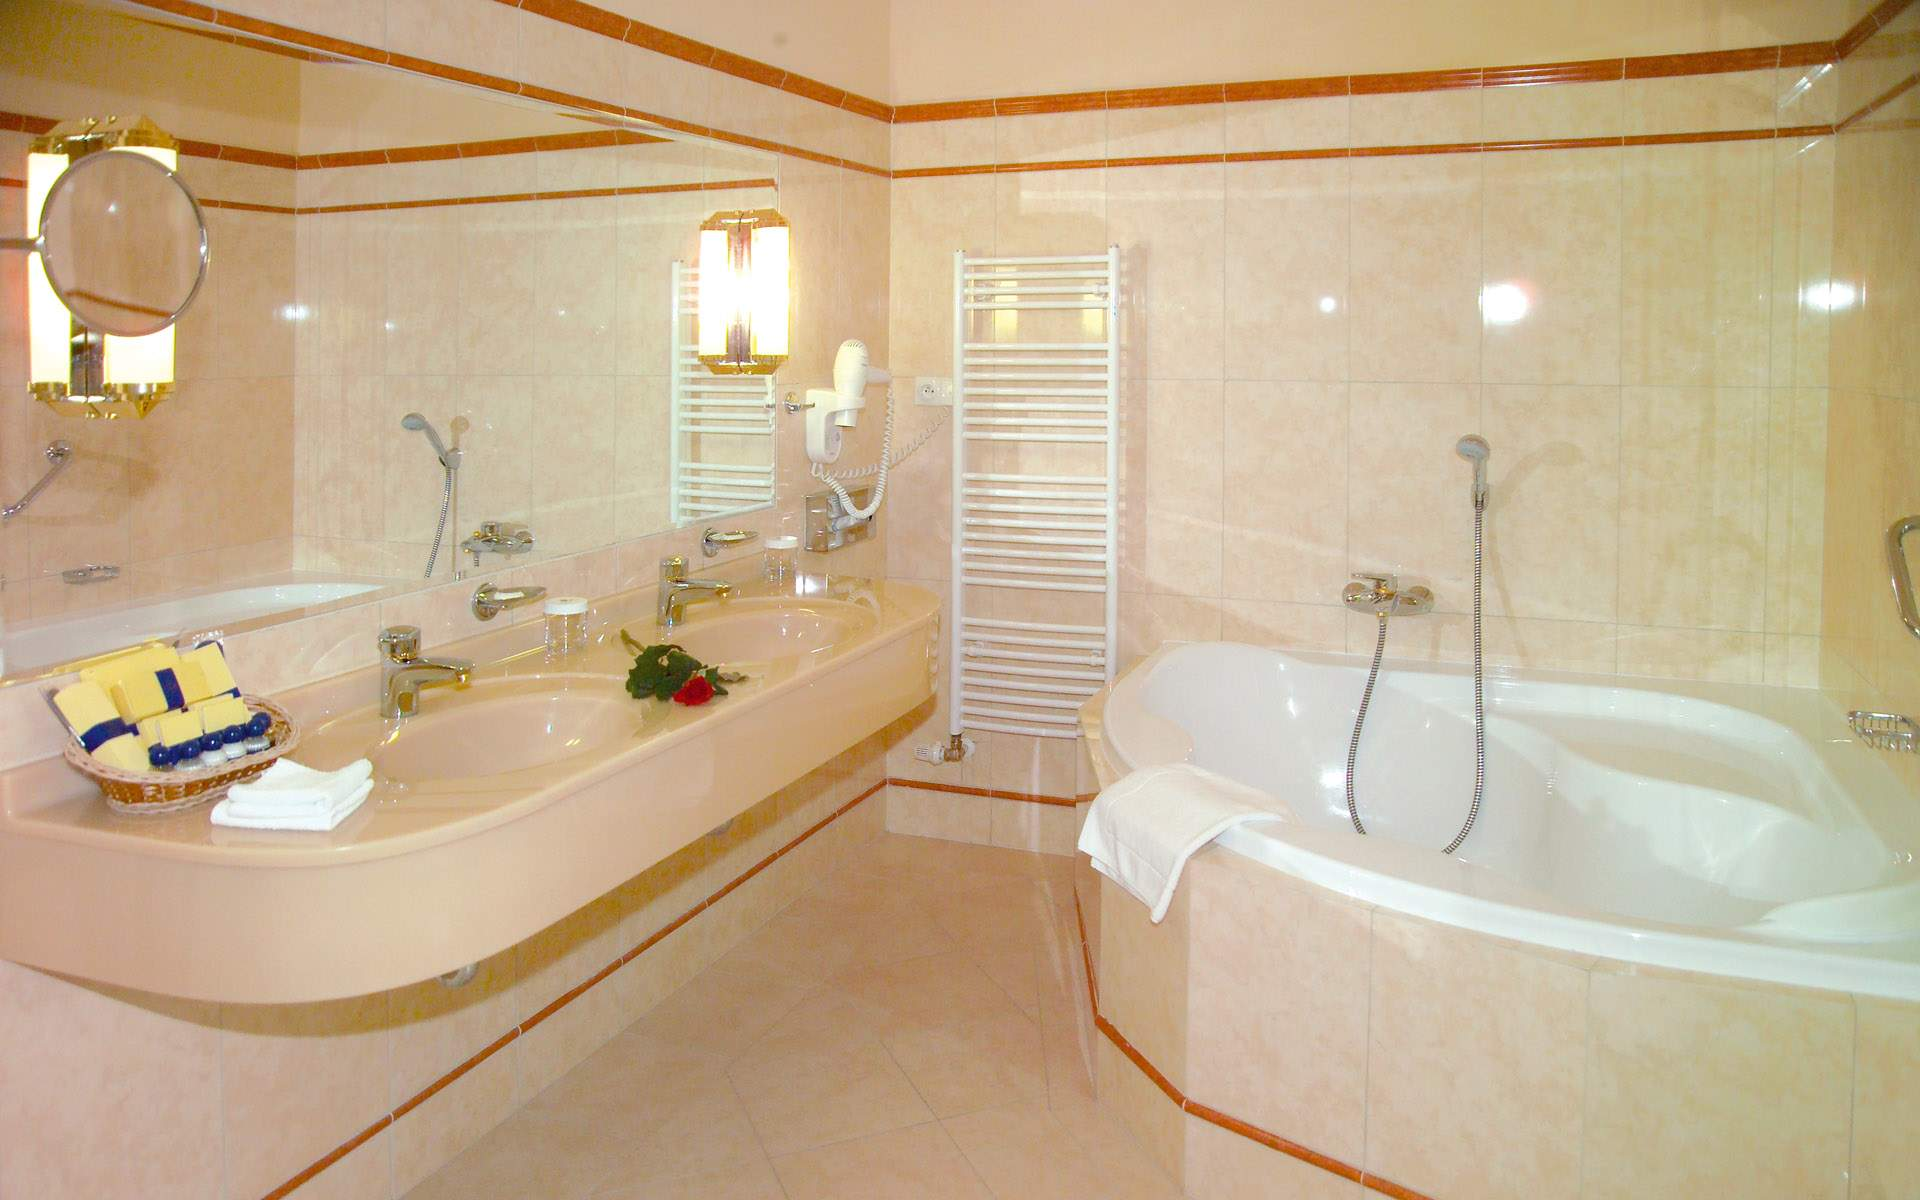 Фото интерьеров квартир интерьер ванных комнат 16 фотография